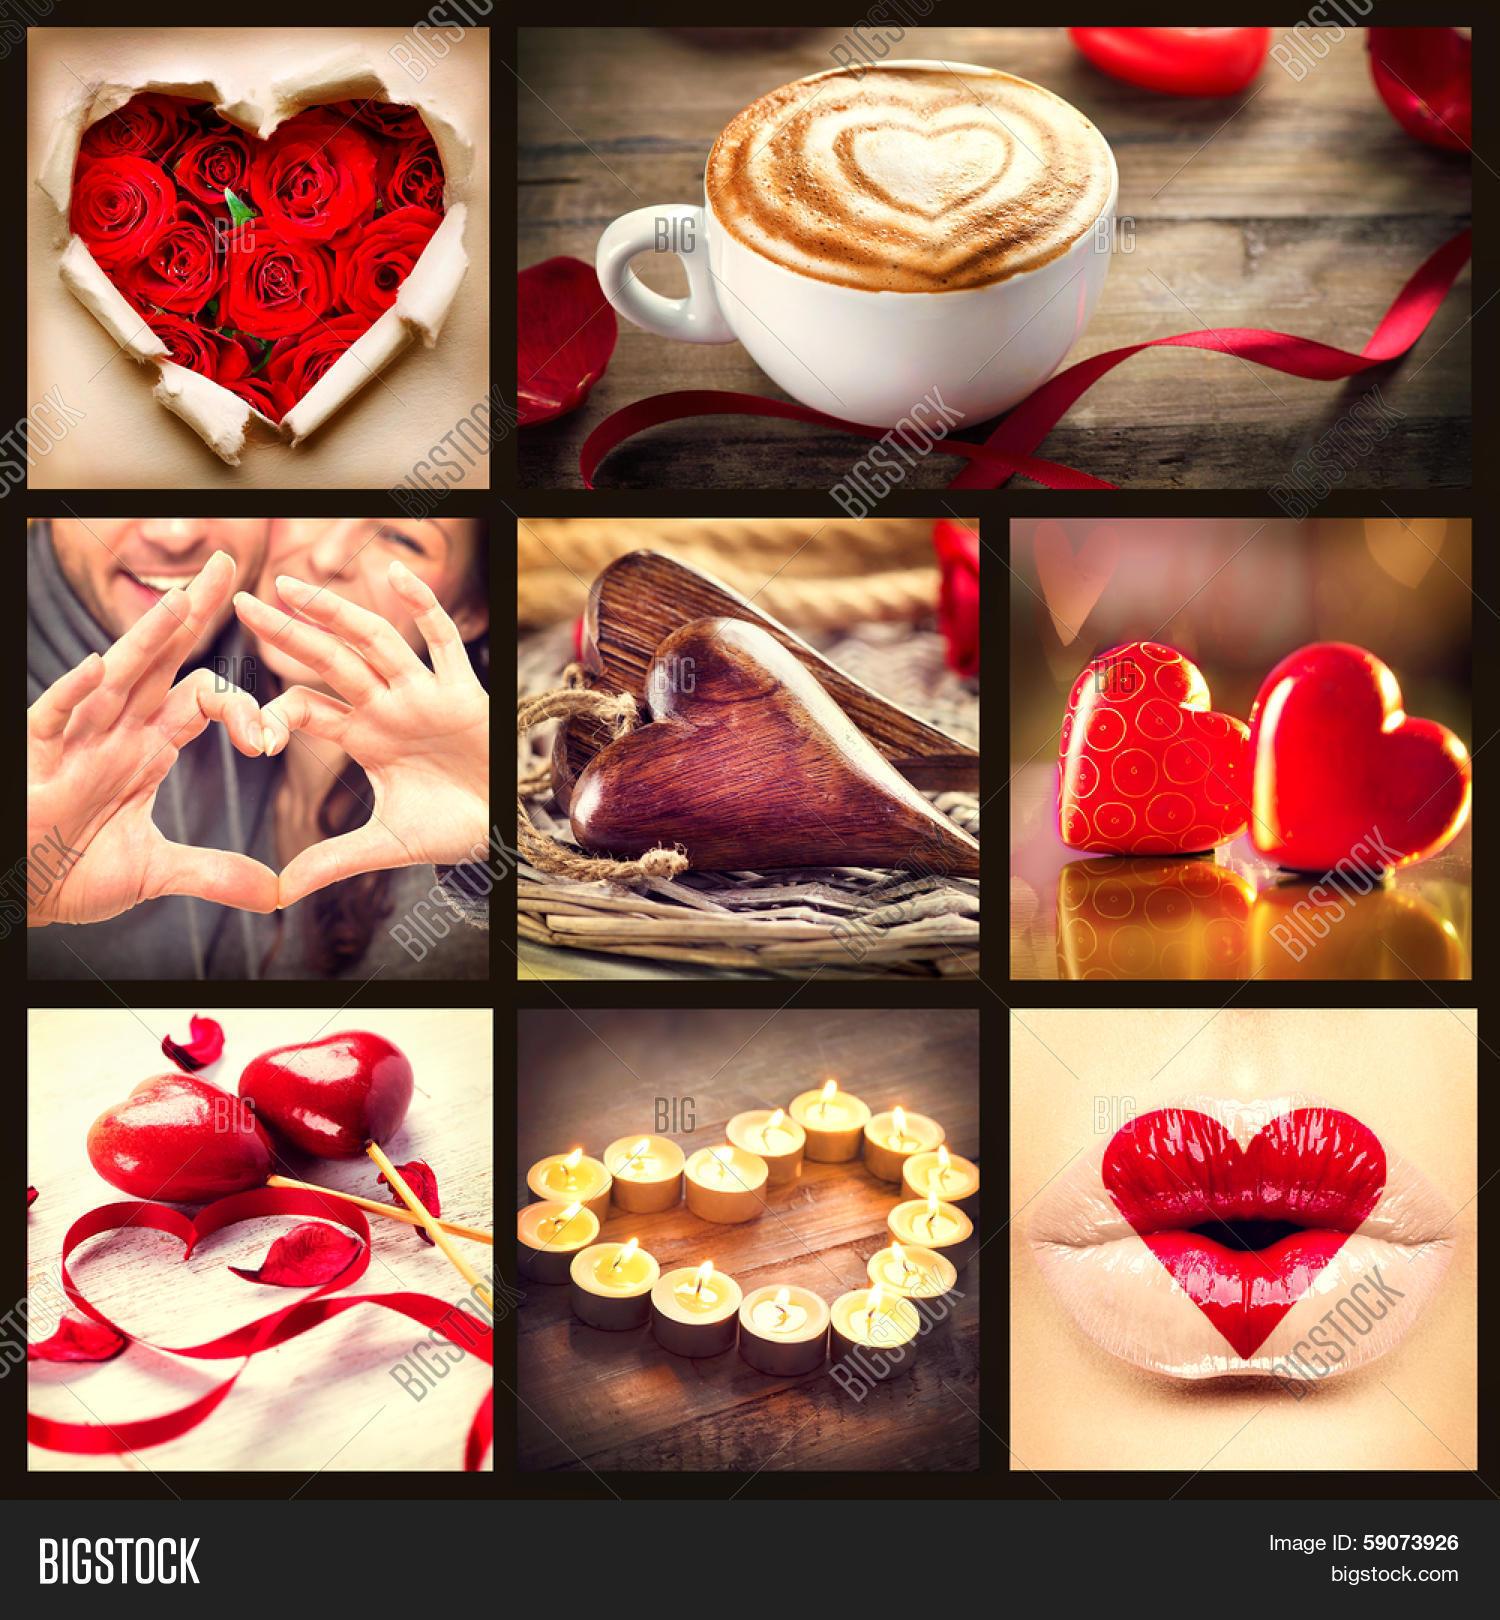 valentine collage image photo free trial bigstock